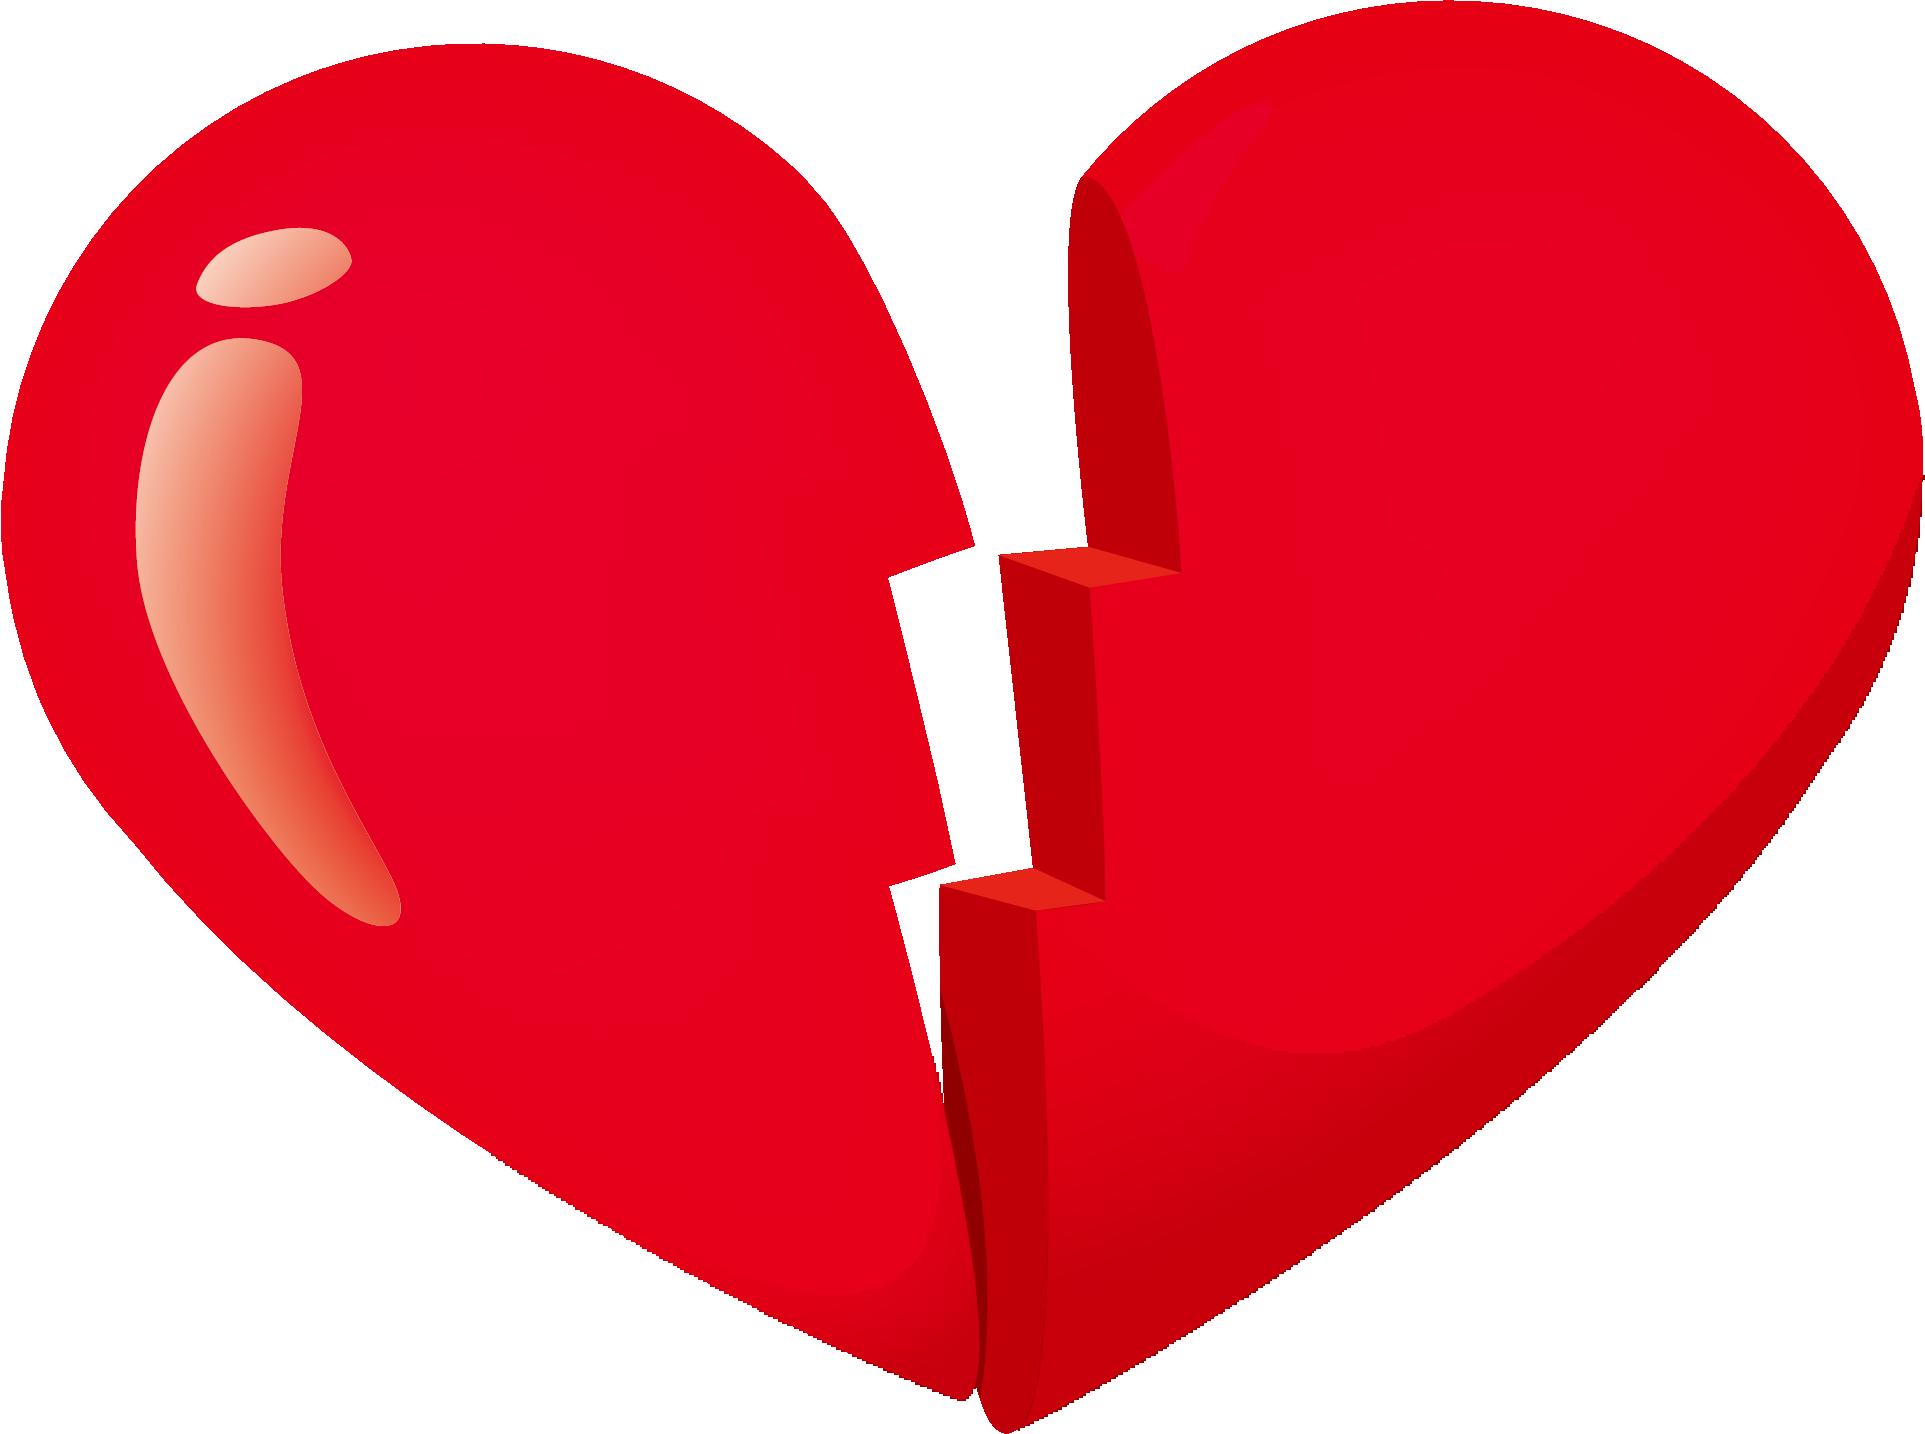 donut clipart heart